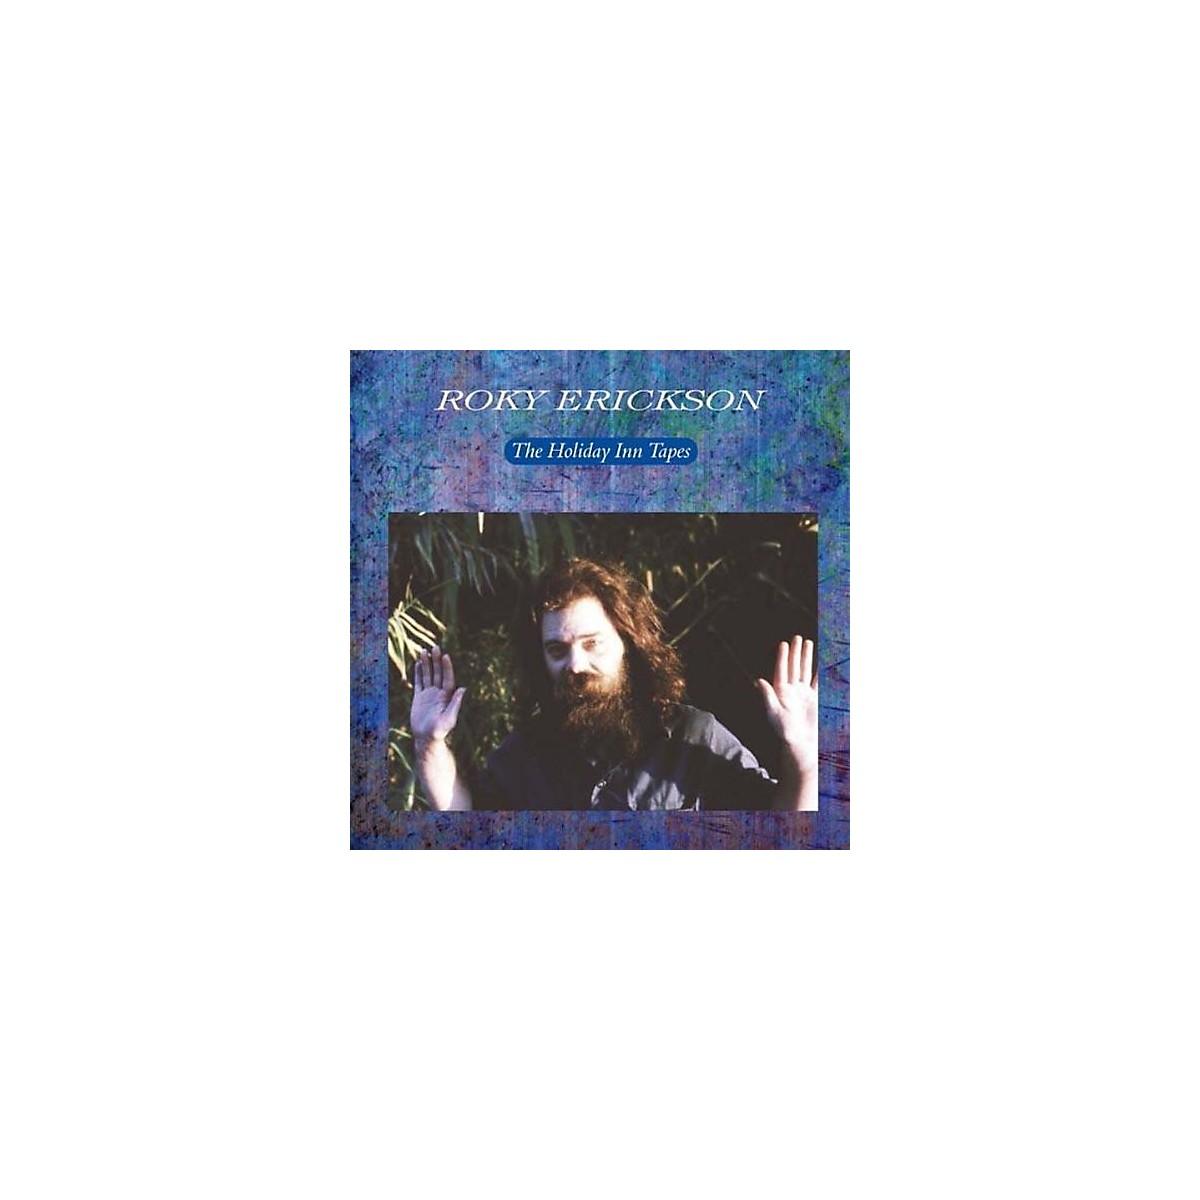 Alliance Roky Erickson - Holiday Inn Tapes